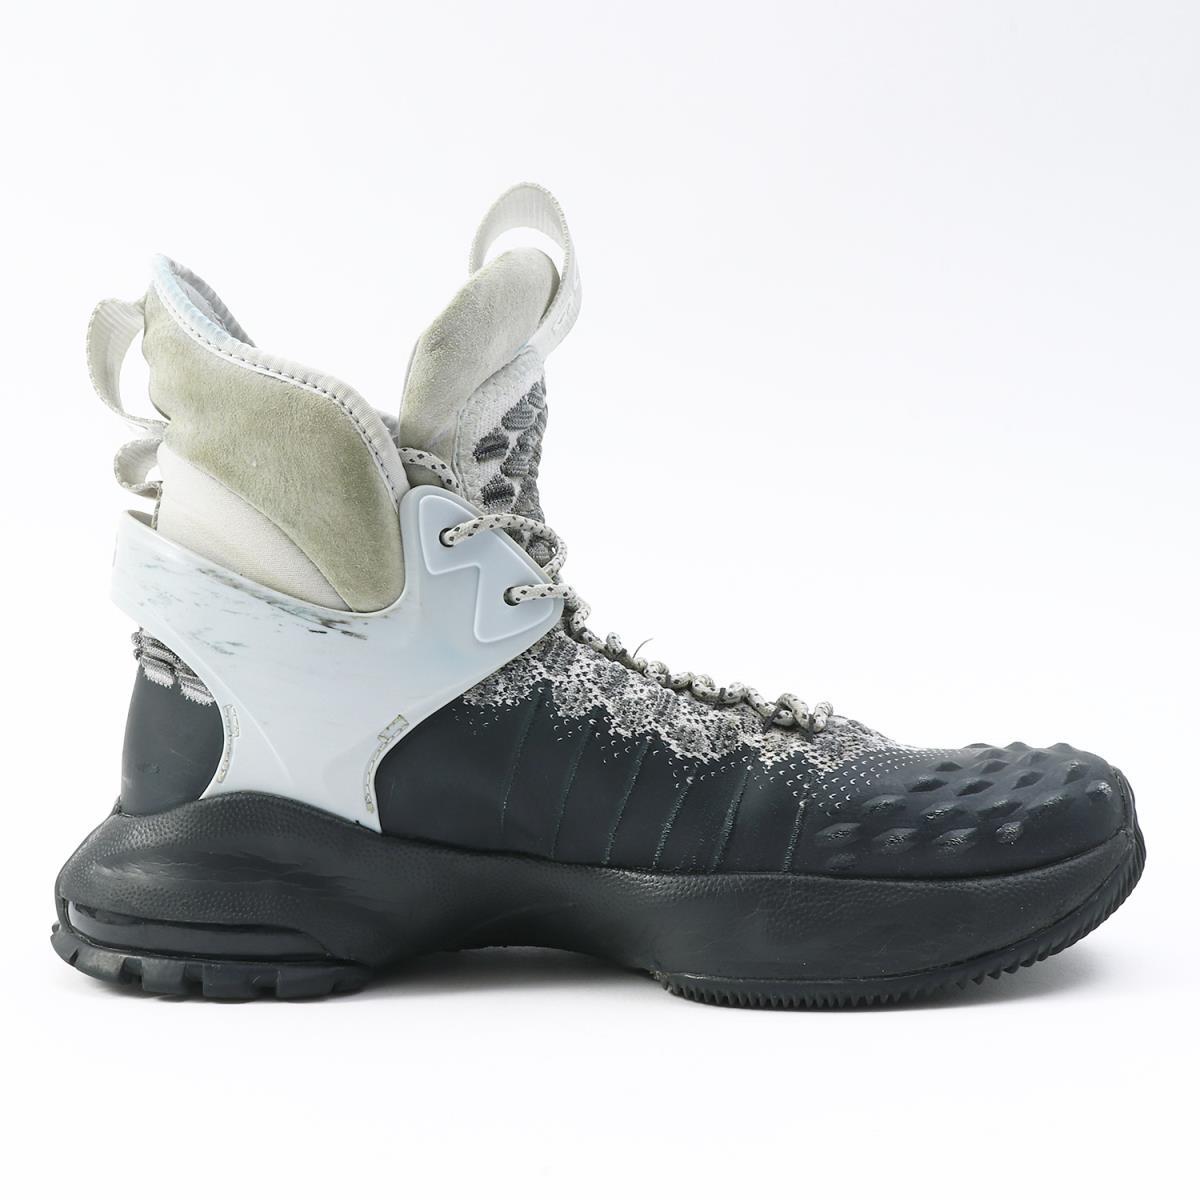 aba0a5cfb8b2 BEEGLE by Boo-Bee  NIKE (Nike) NikeLab ACG ZOOM TALLAC FLYKNIT ...